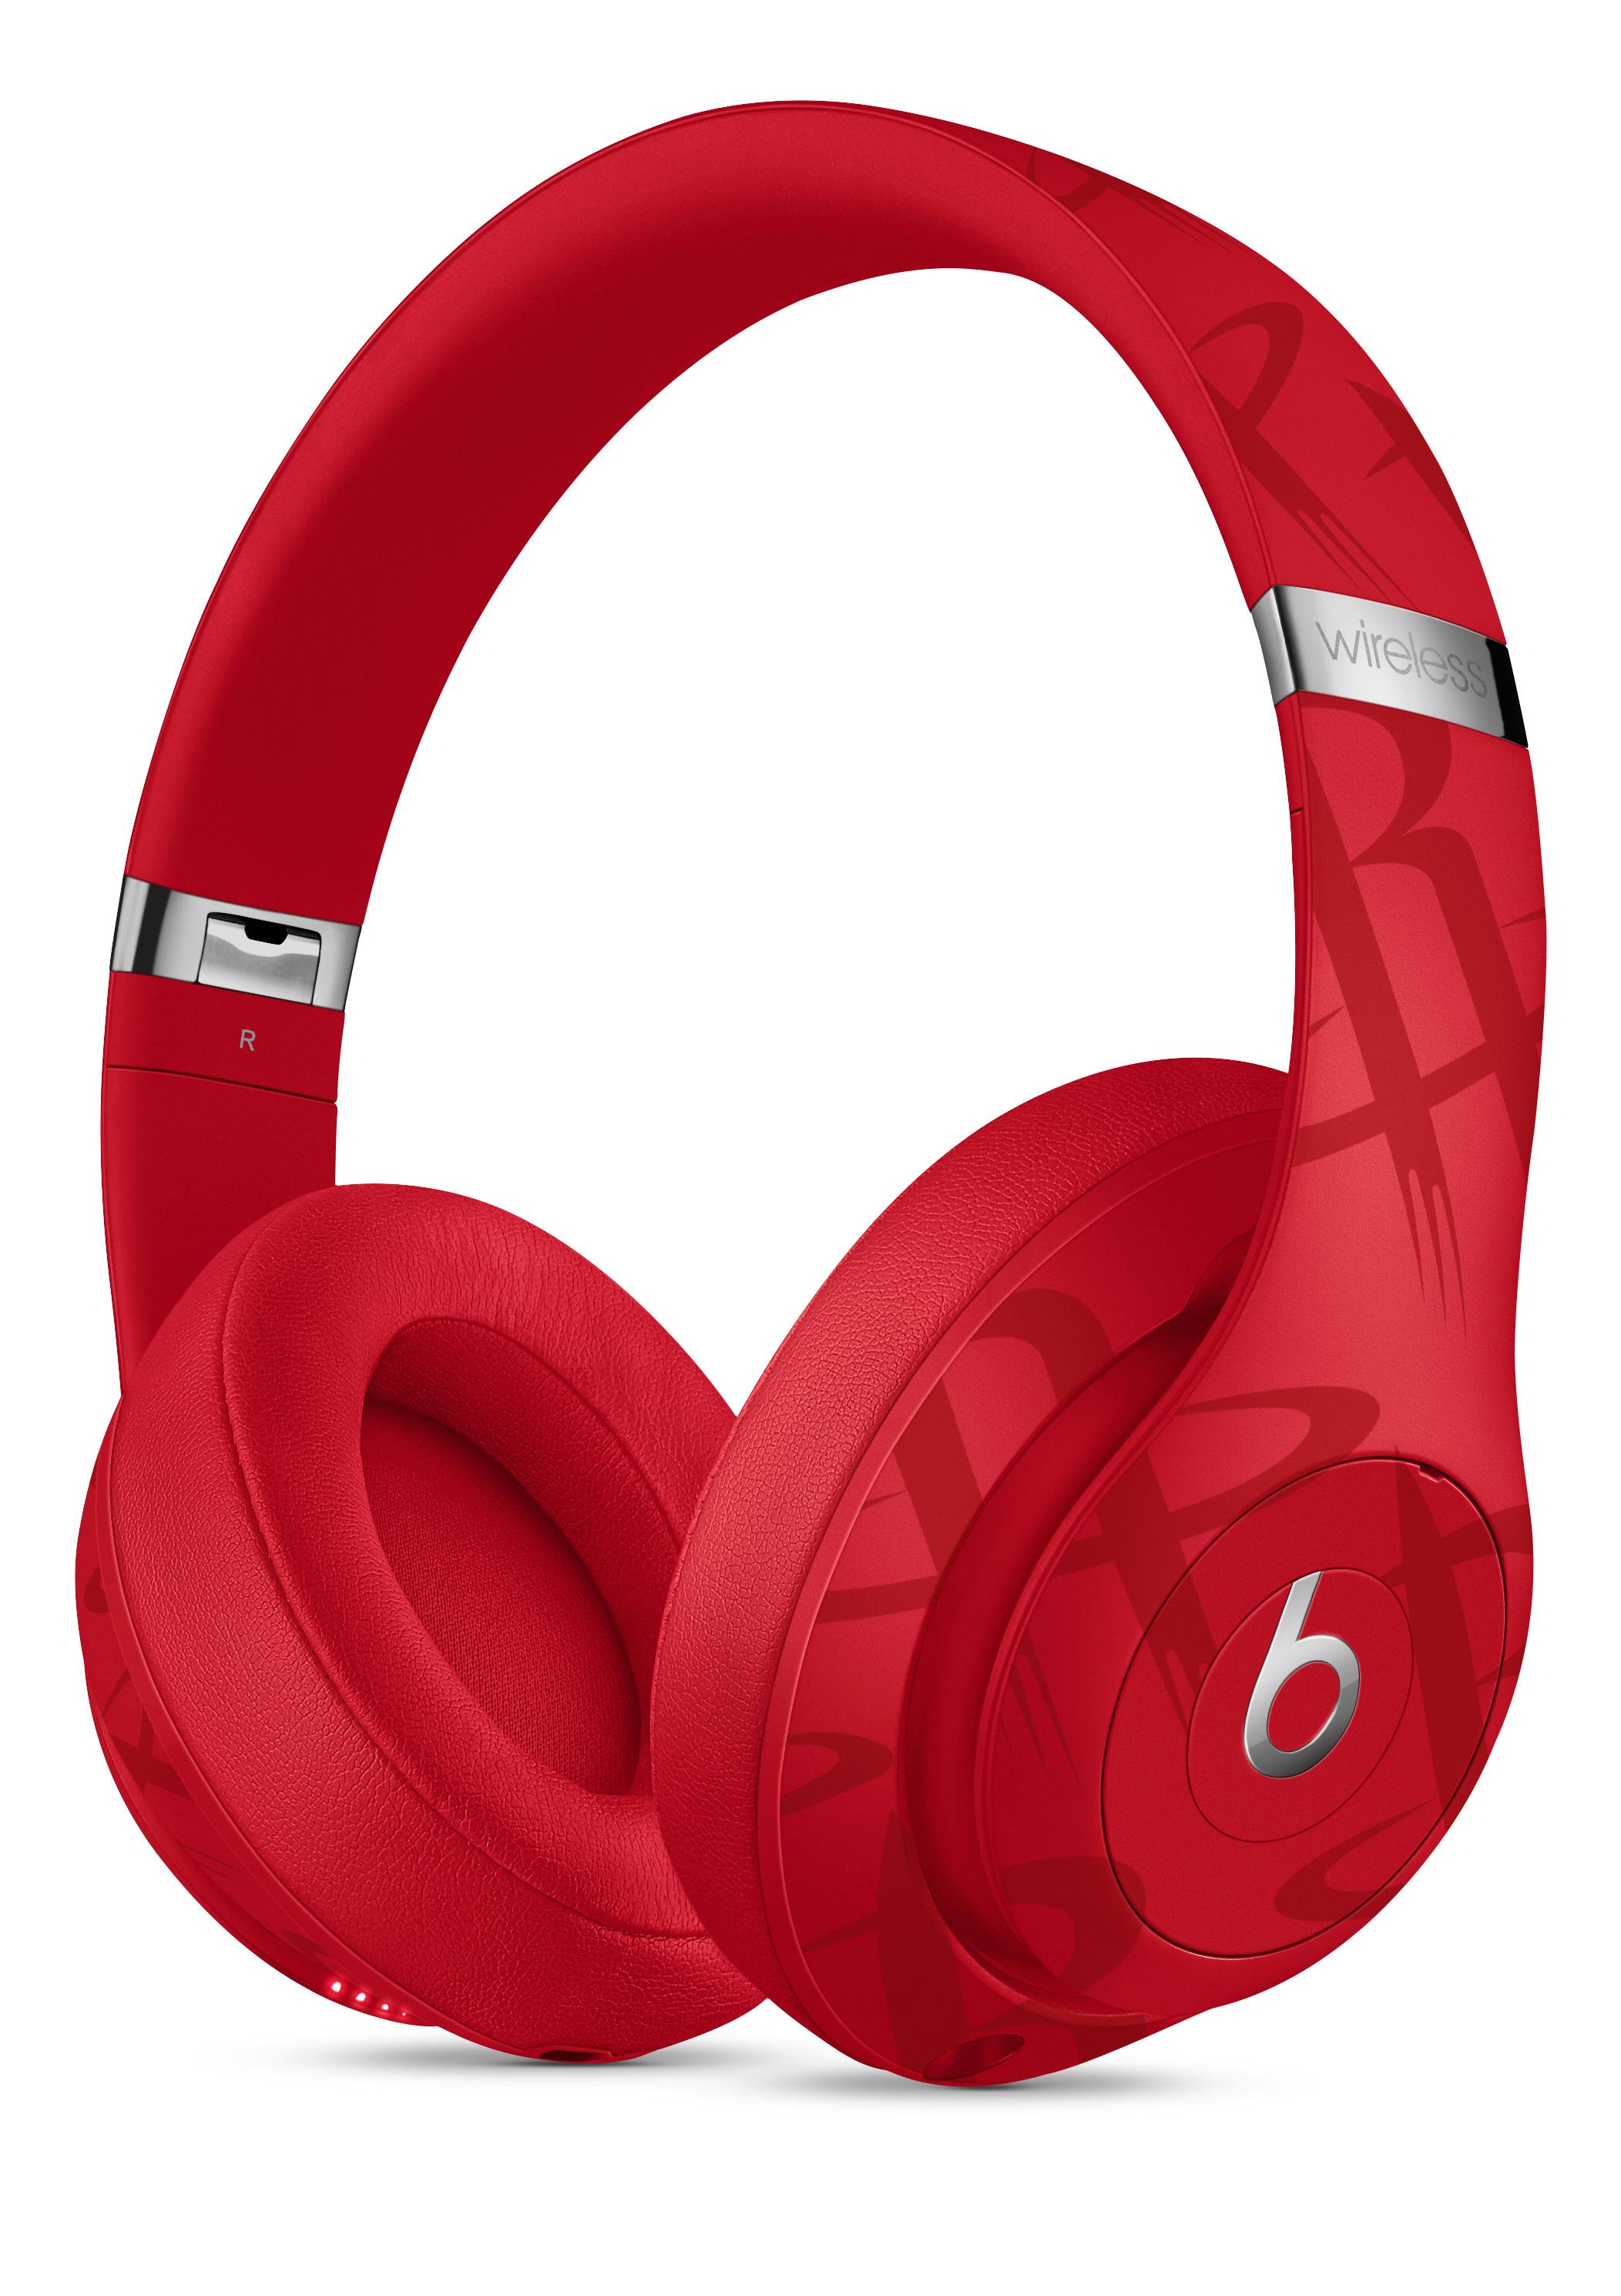 Beats Studio3 Wireless Headphones Nba Collection Rockets Red Education Apple